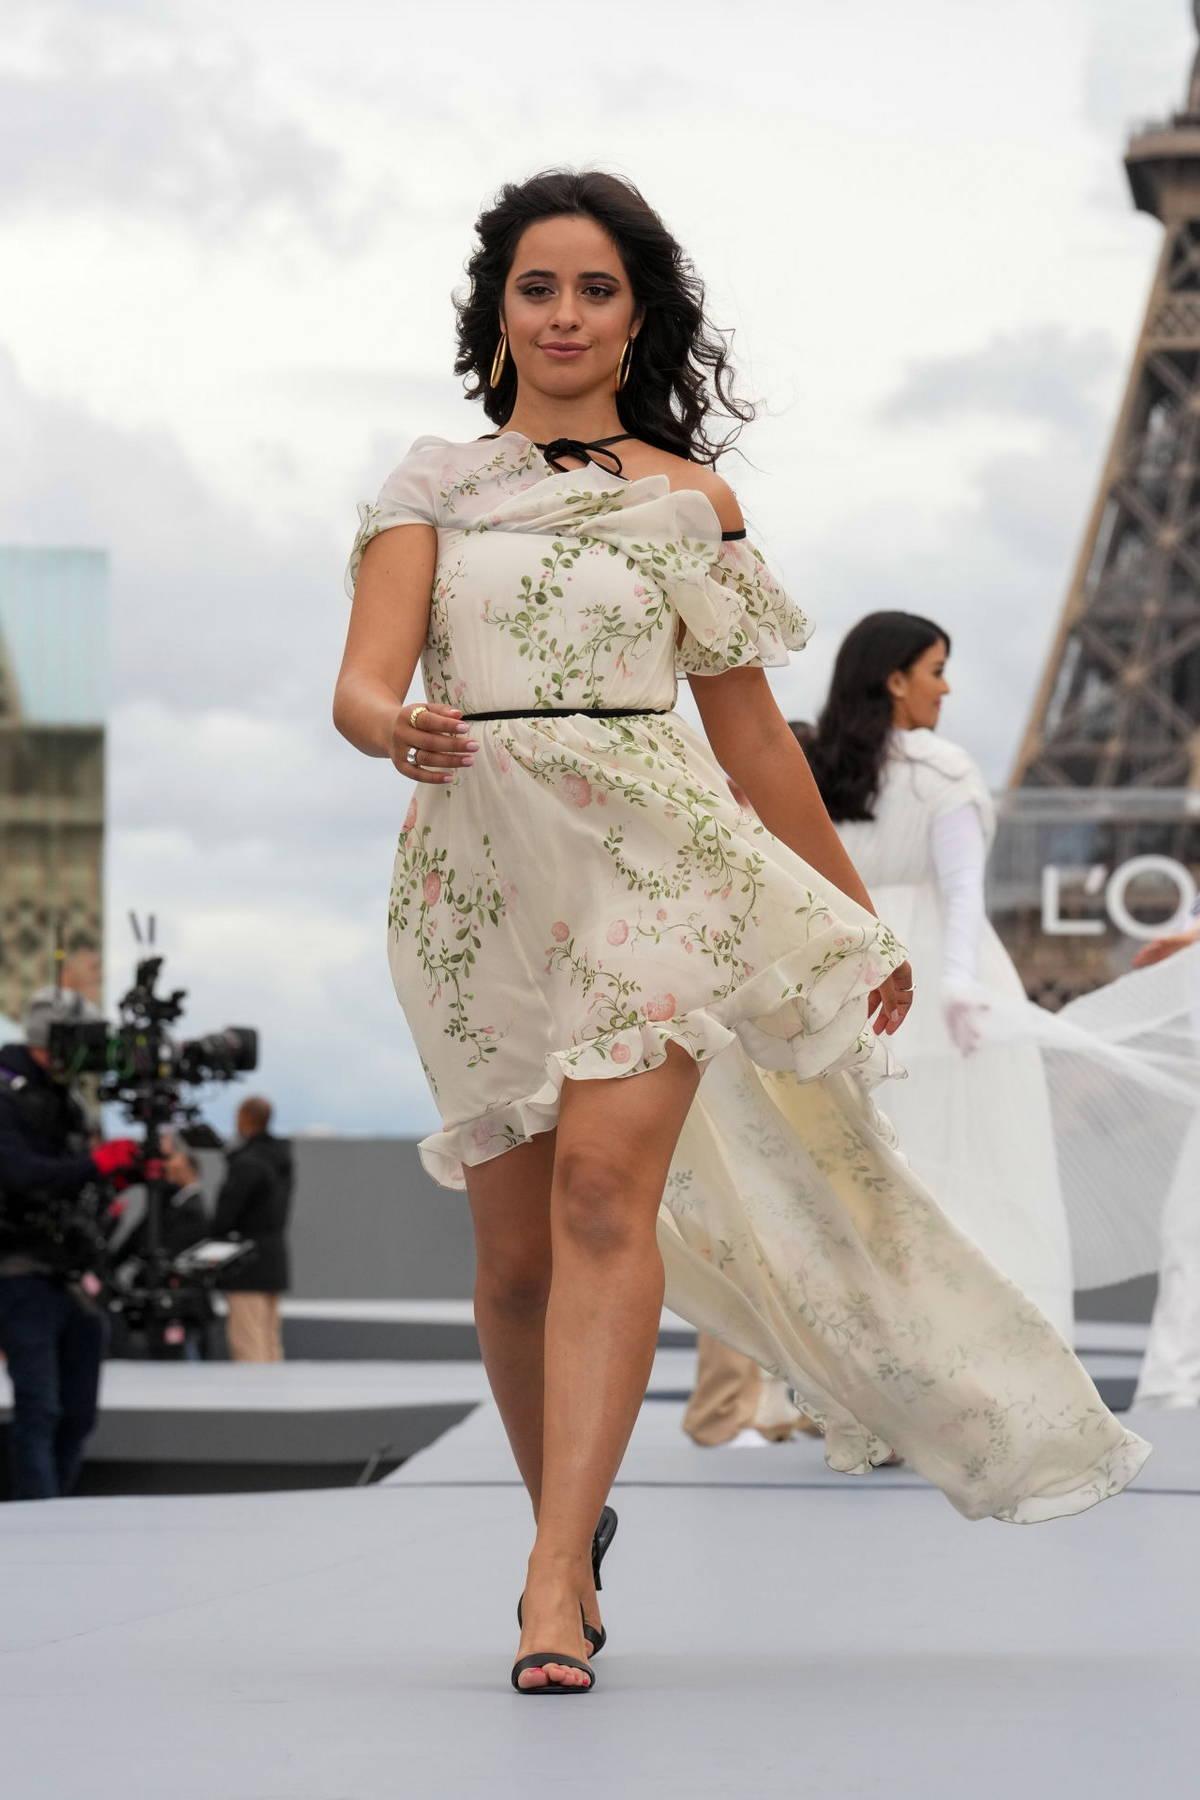 Camila Cabello attends the Le Defile L'Oreal Paris 2021 Show during Paris Fashion Week in Paris, France